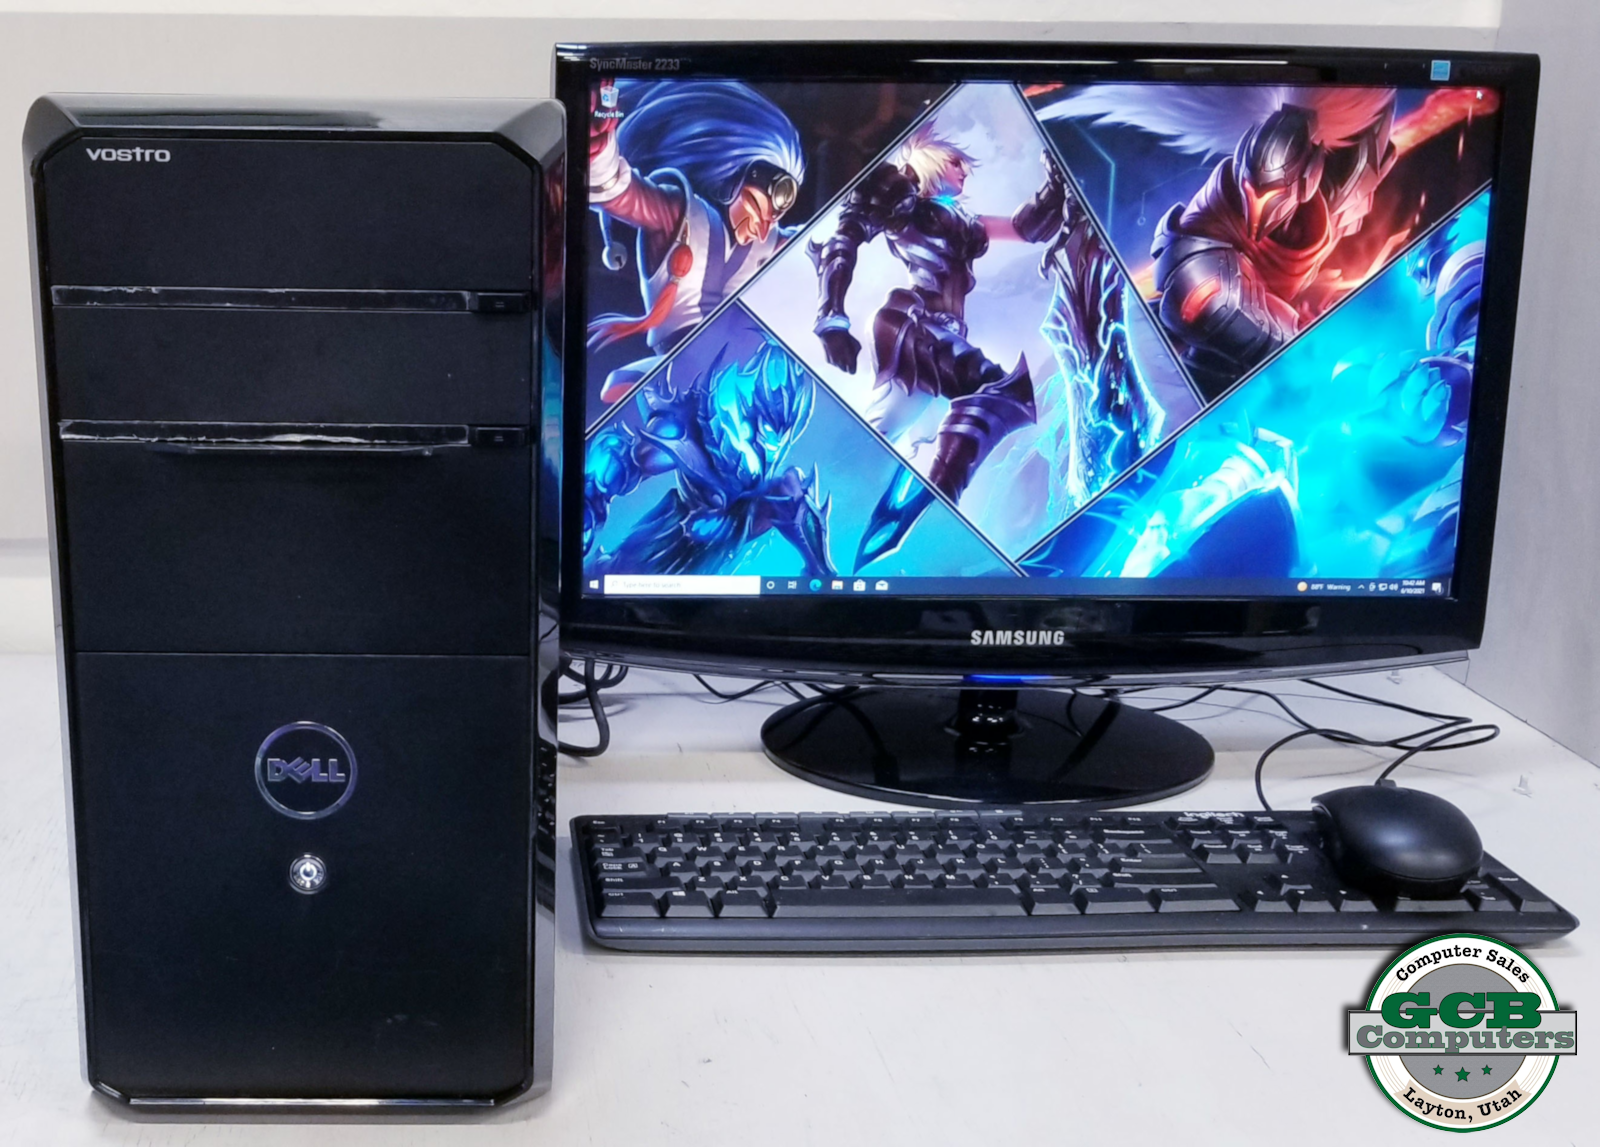 $220 Dell Vostro Light Gamer i7-2600 128GB SSD 1TB HDD 16GB RAM GTX 650